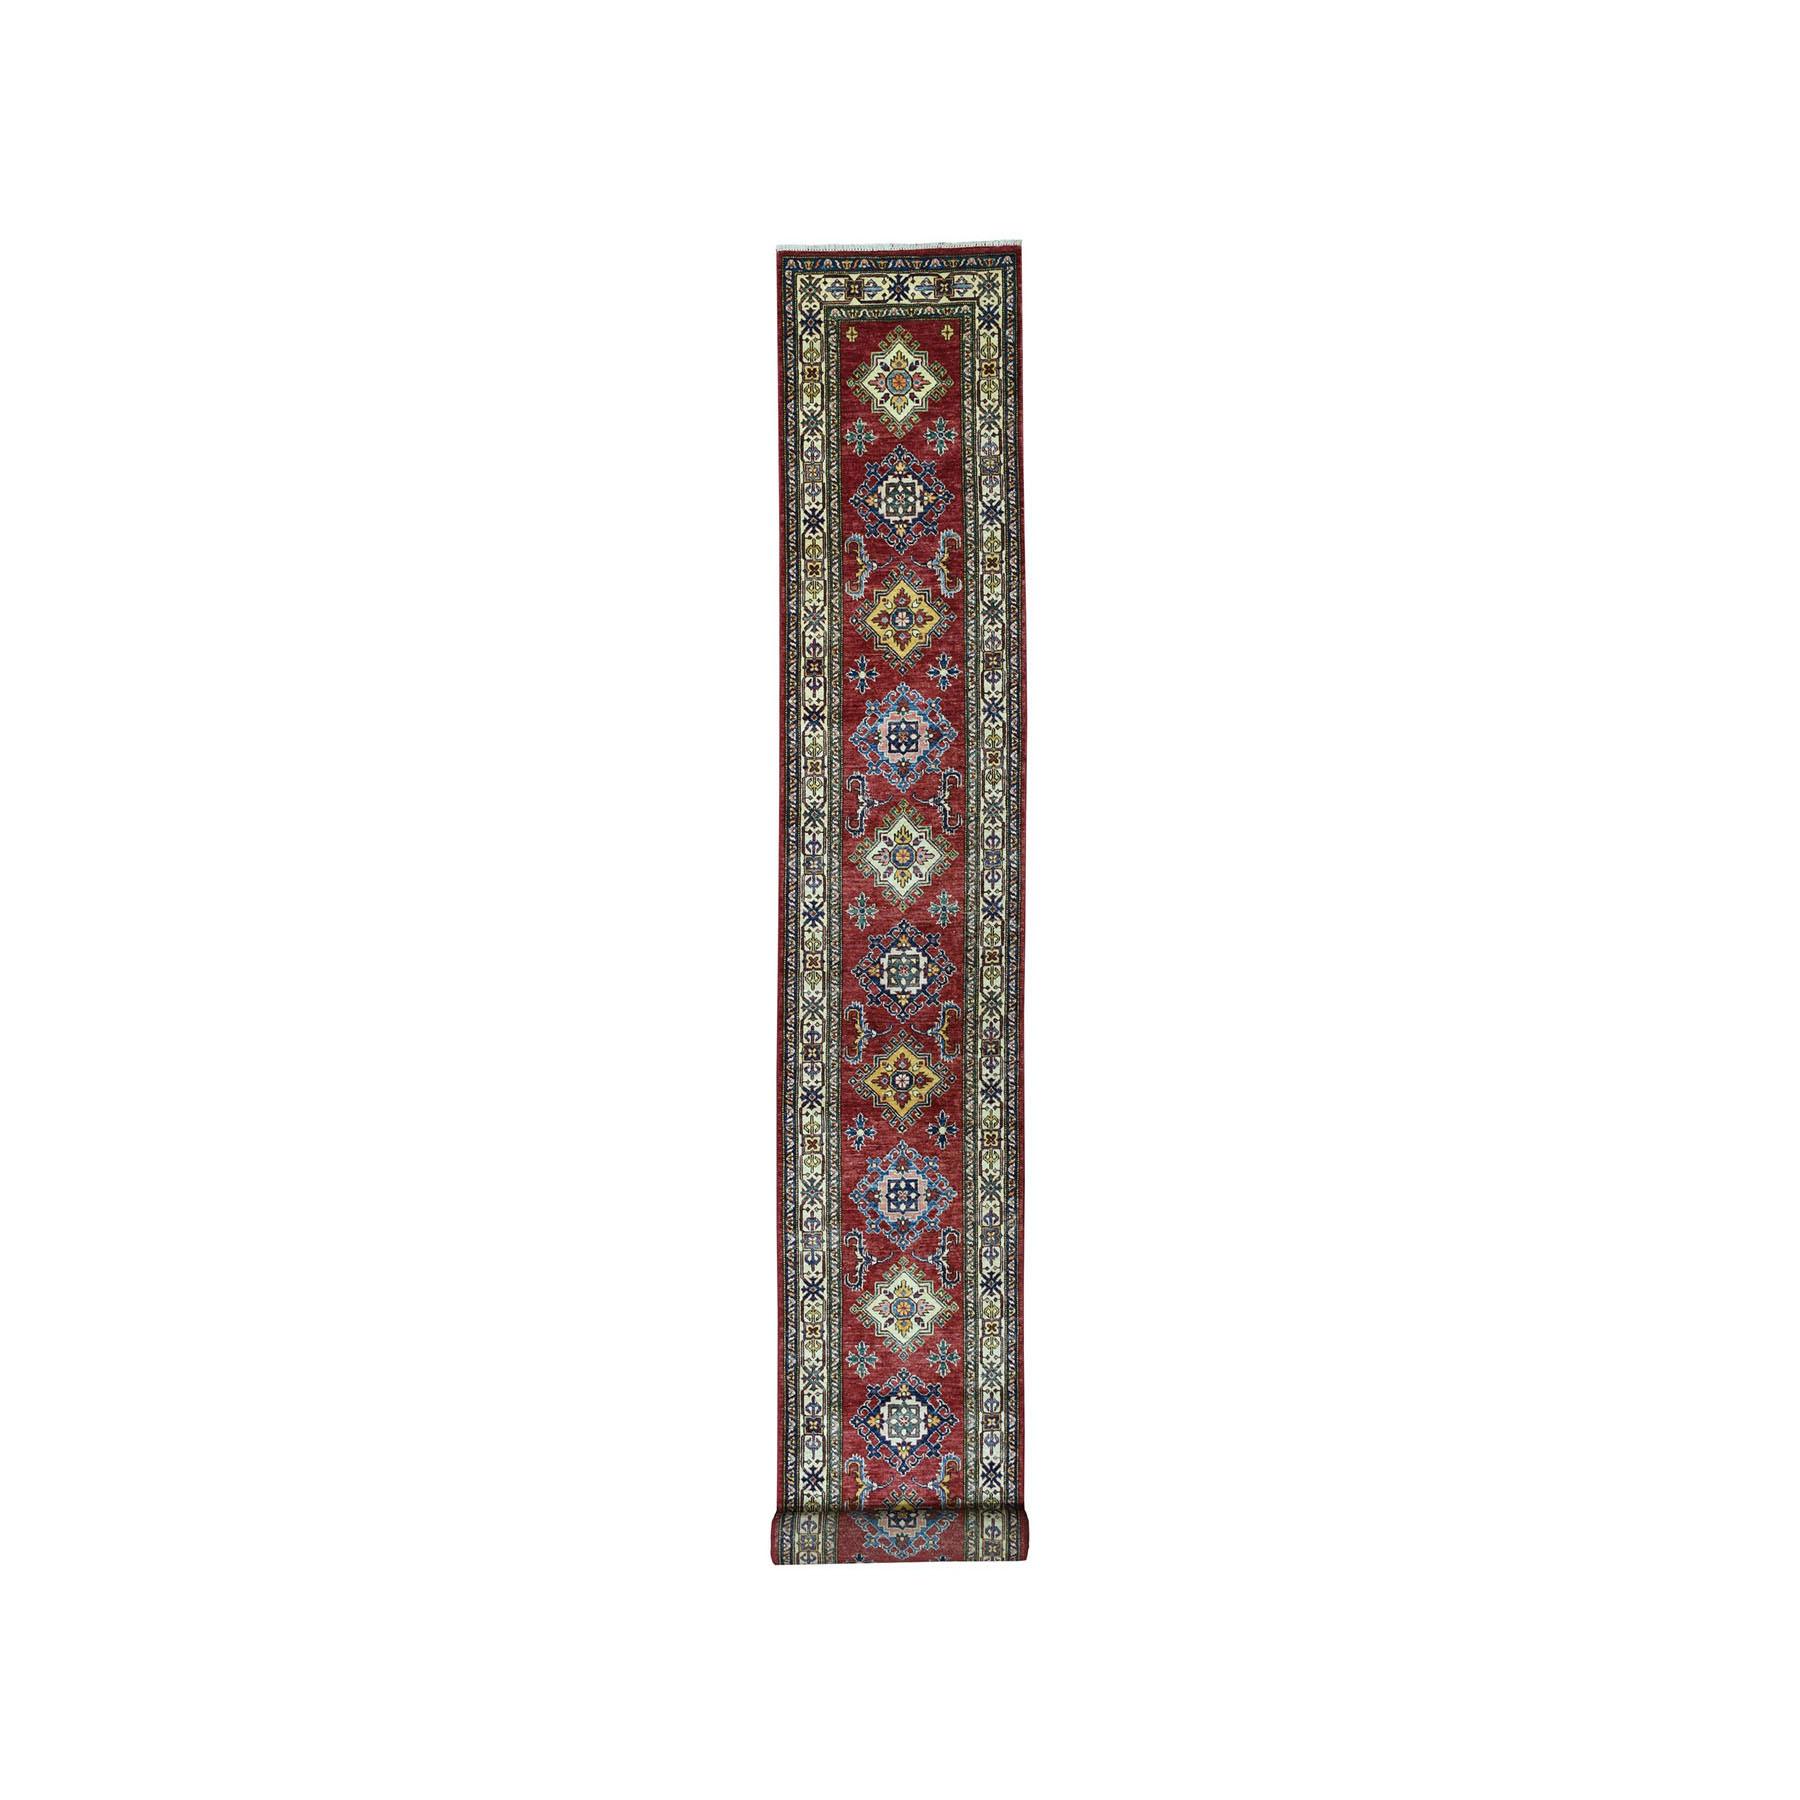 "2'4""X18'2"" Red Super Kazak Pure Wool Geometric Design Hand-Knotted Xl Runner Oriental Rug moaea08e"